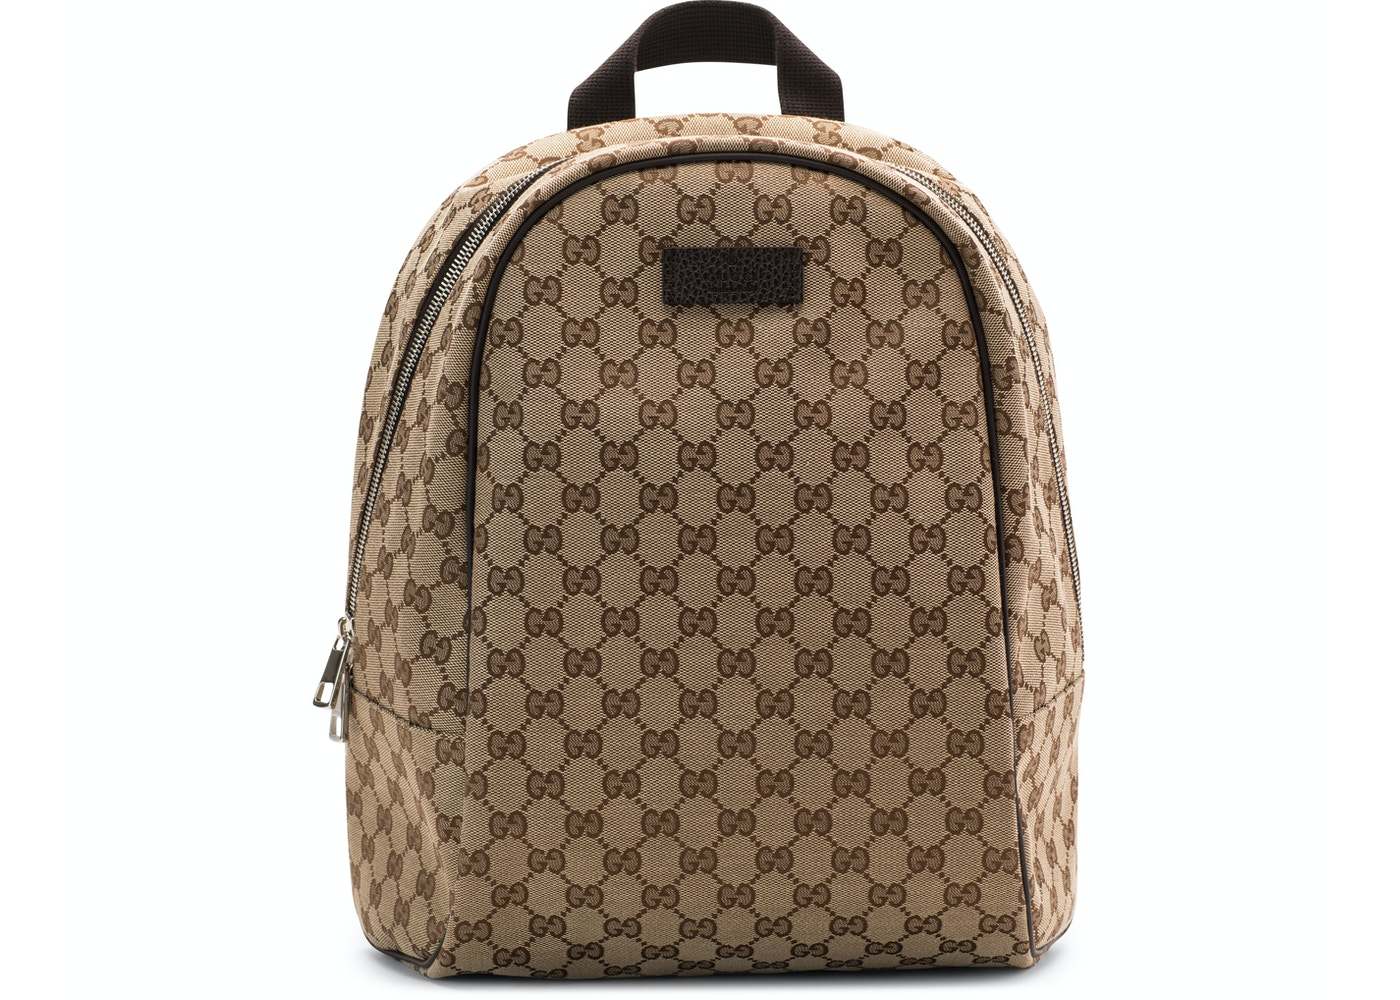 ea8bc8474e19 Gucci Top Zip Backpack Monogram GG Beige/Brown. Monogram GG Beige/Brown